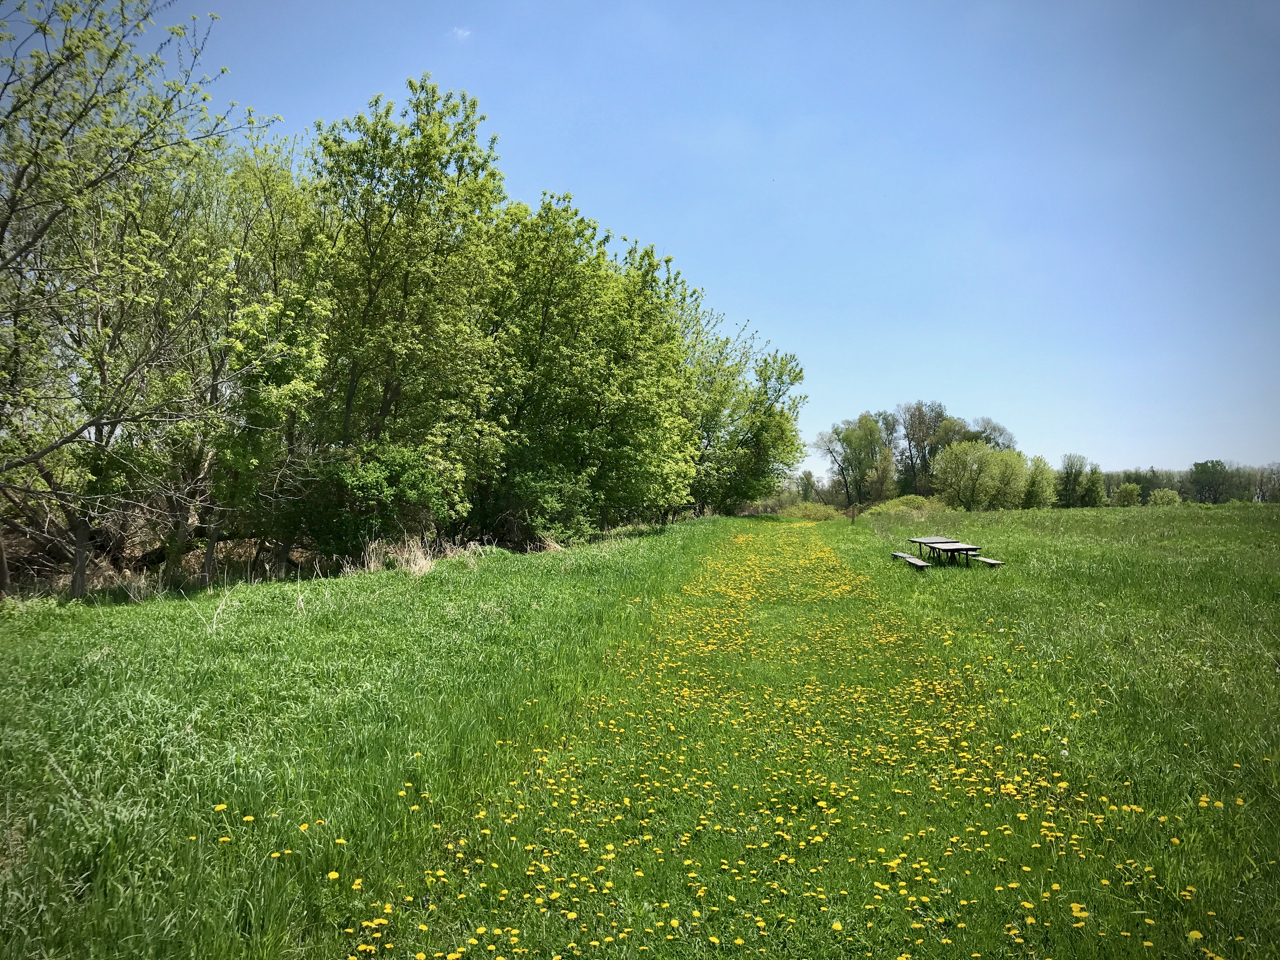 Dandelion Road. Lake Farm Park. Madison, Wisconsin. May 2018. © William D. Walker